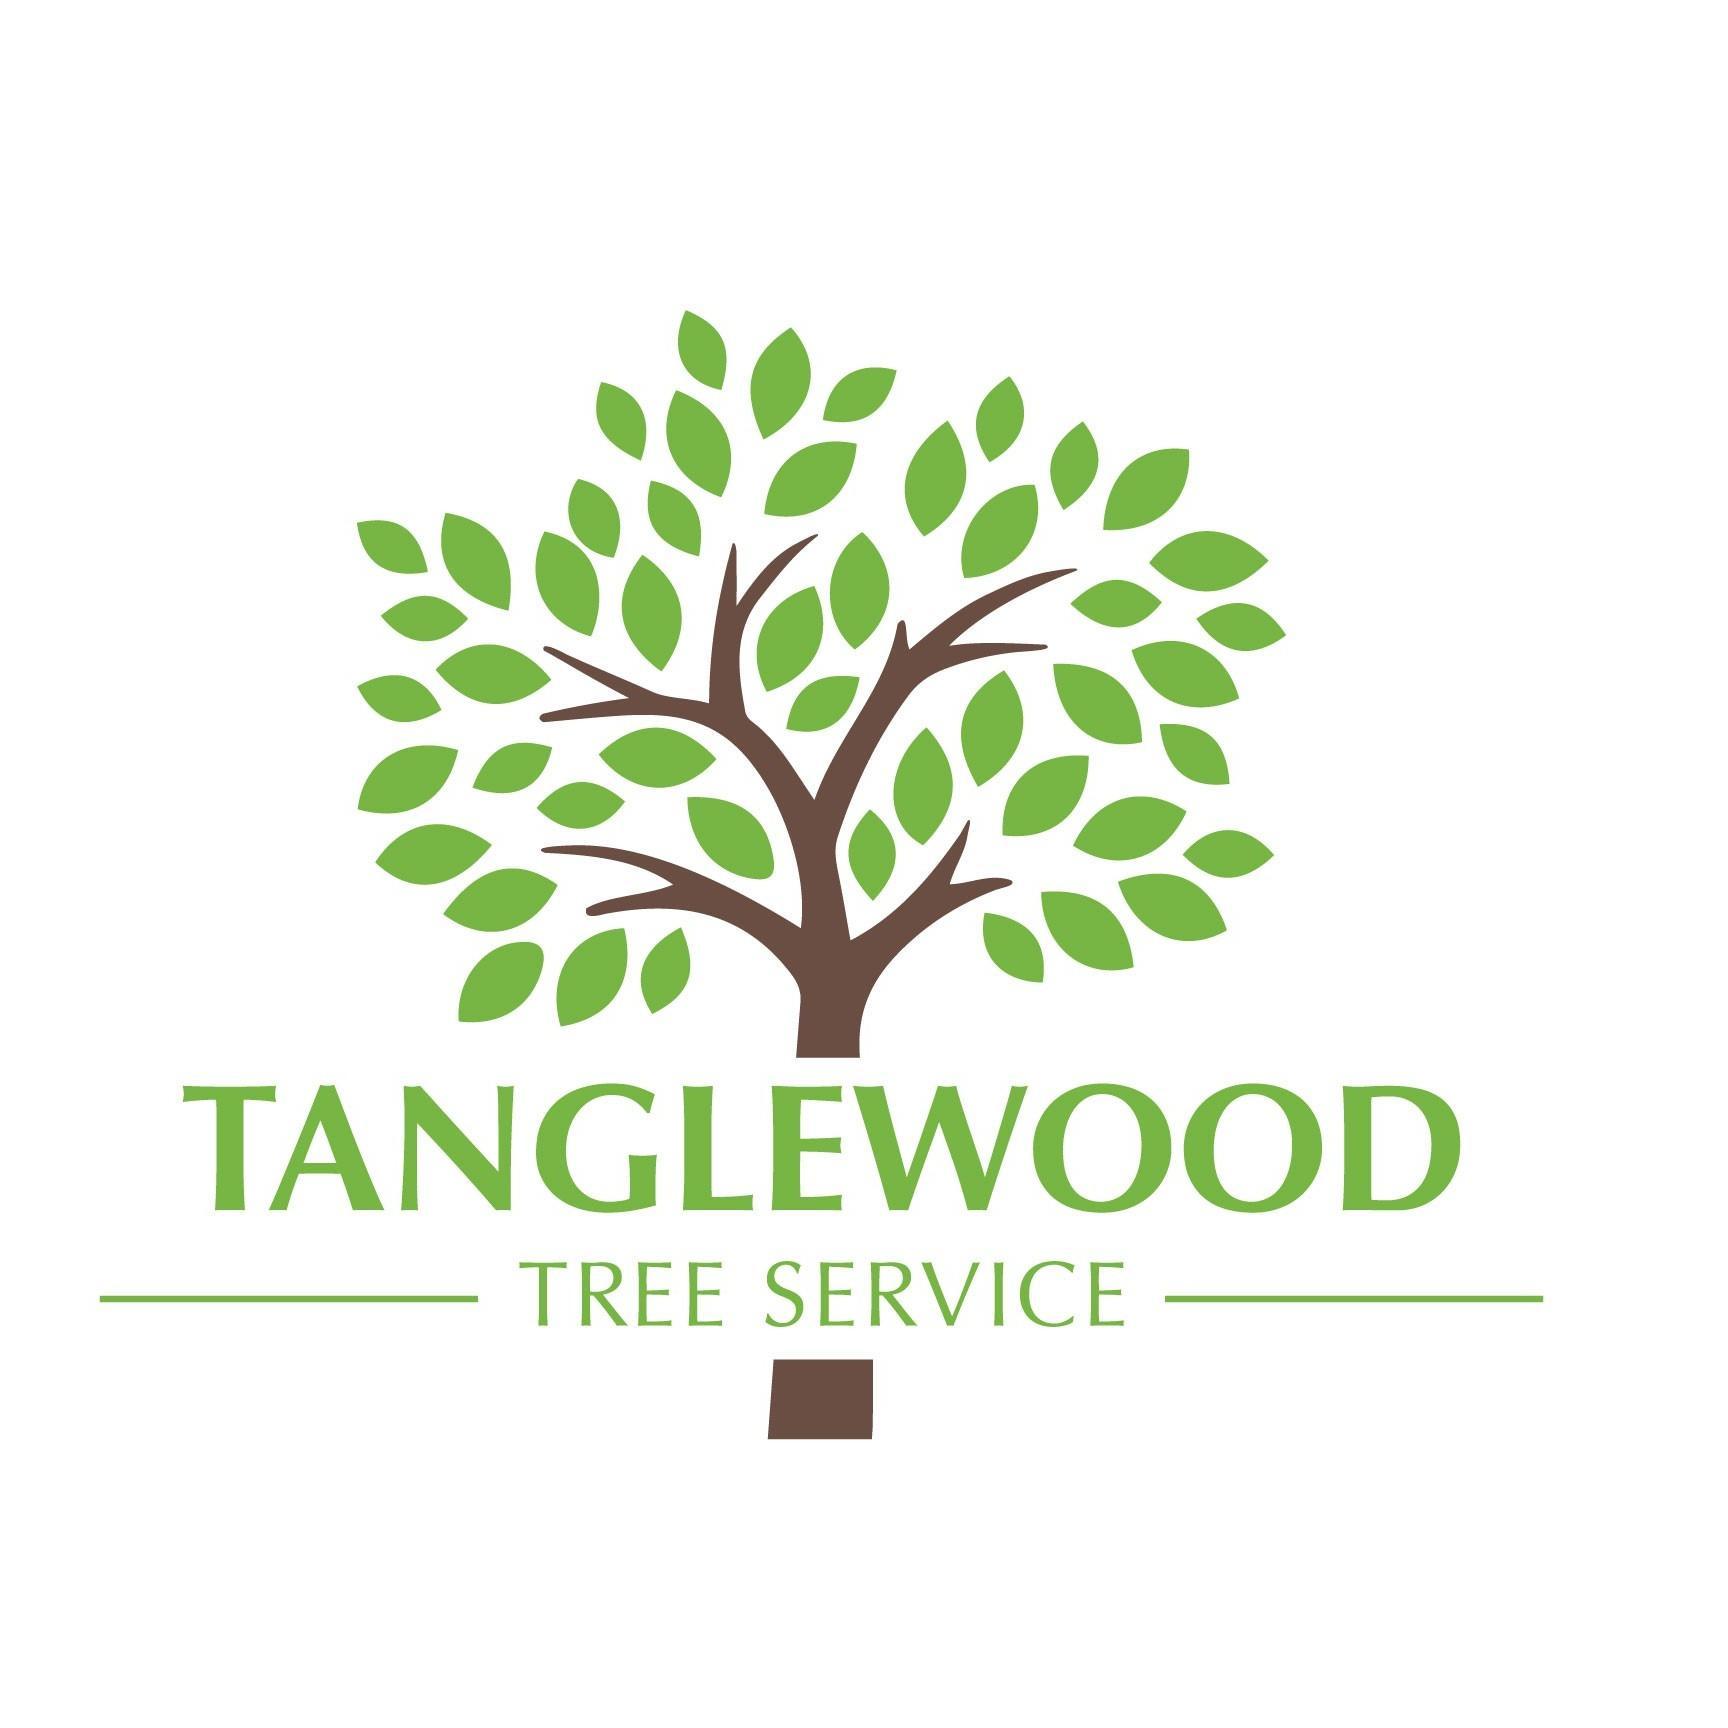 Tanglewood Tree Service